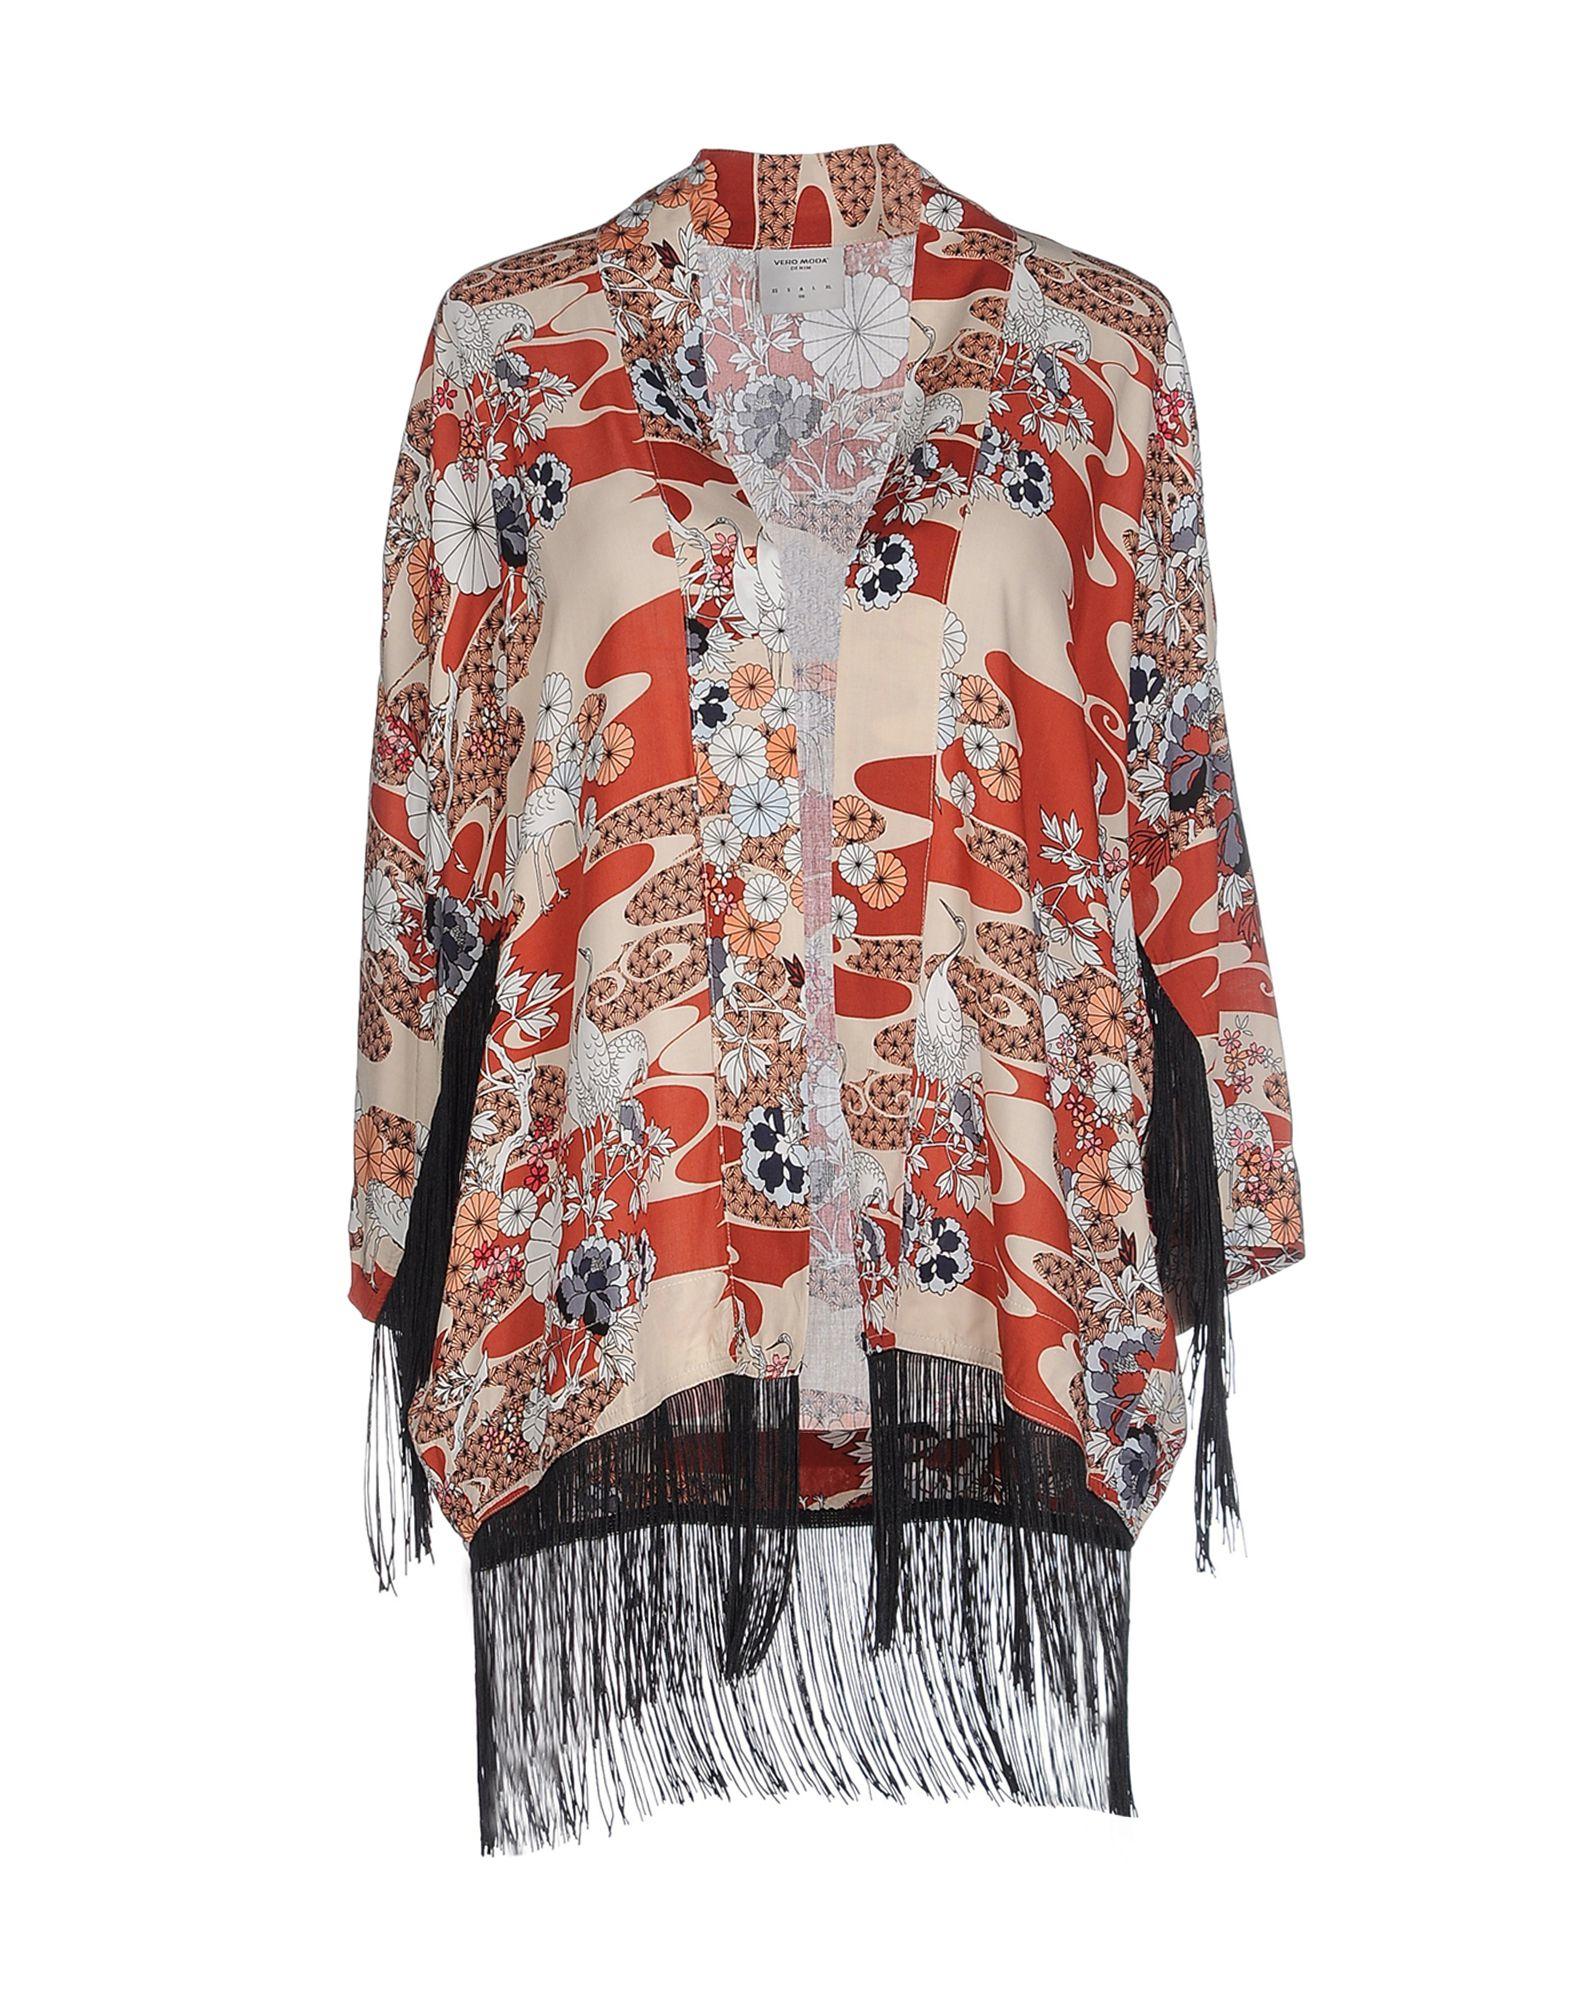 Vero Moda Knitting Patterns : Lyst vero moda cardigan in red